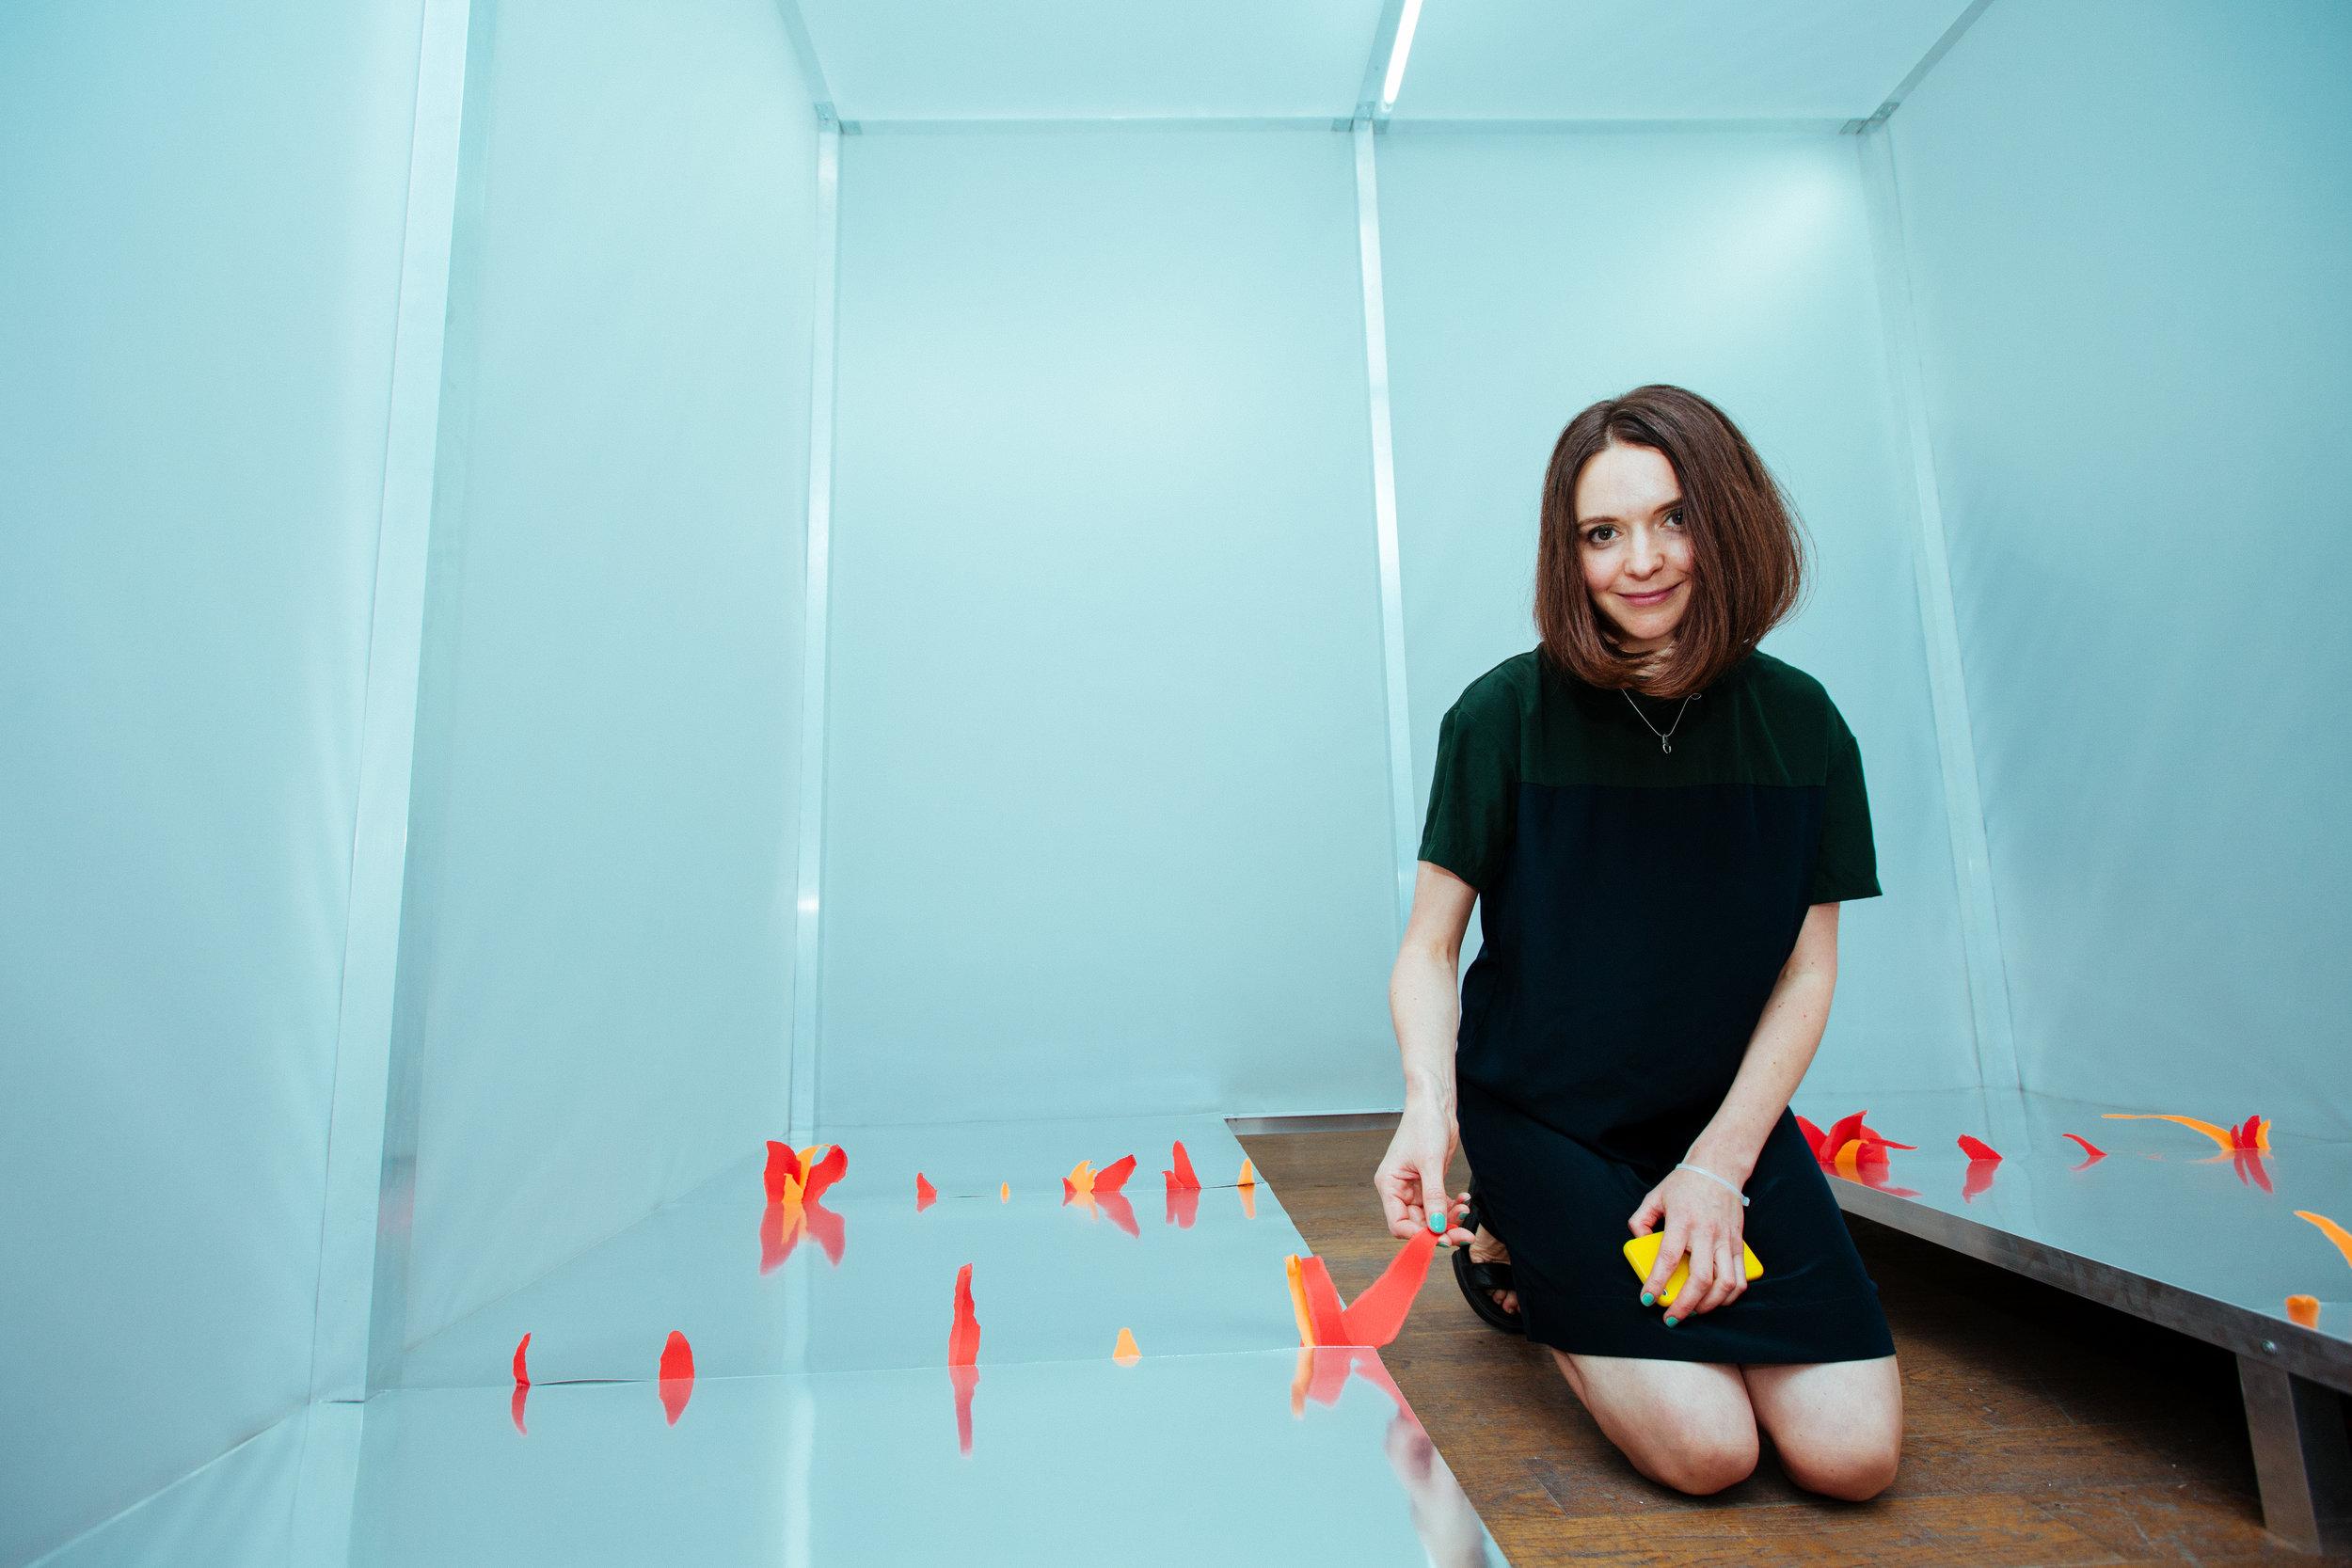 ….  Svetlana Shuvaeva with a part of the installation  ..  Светлана Шуваева с фрагментом инсталляции  ….